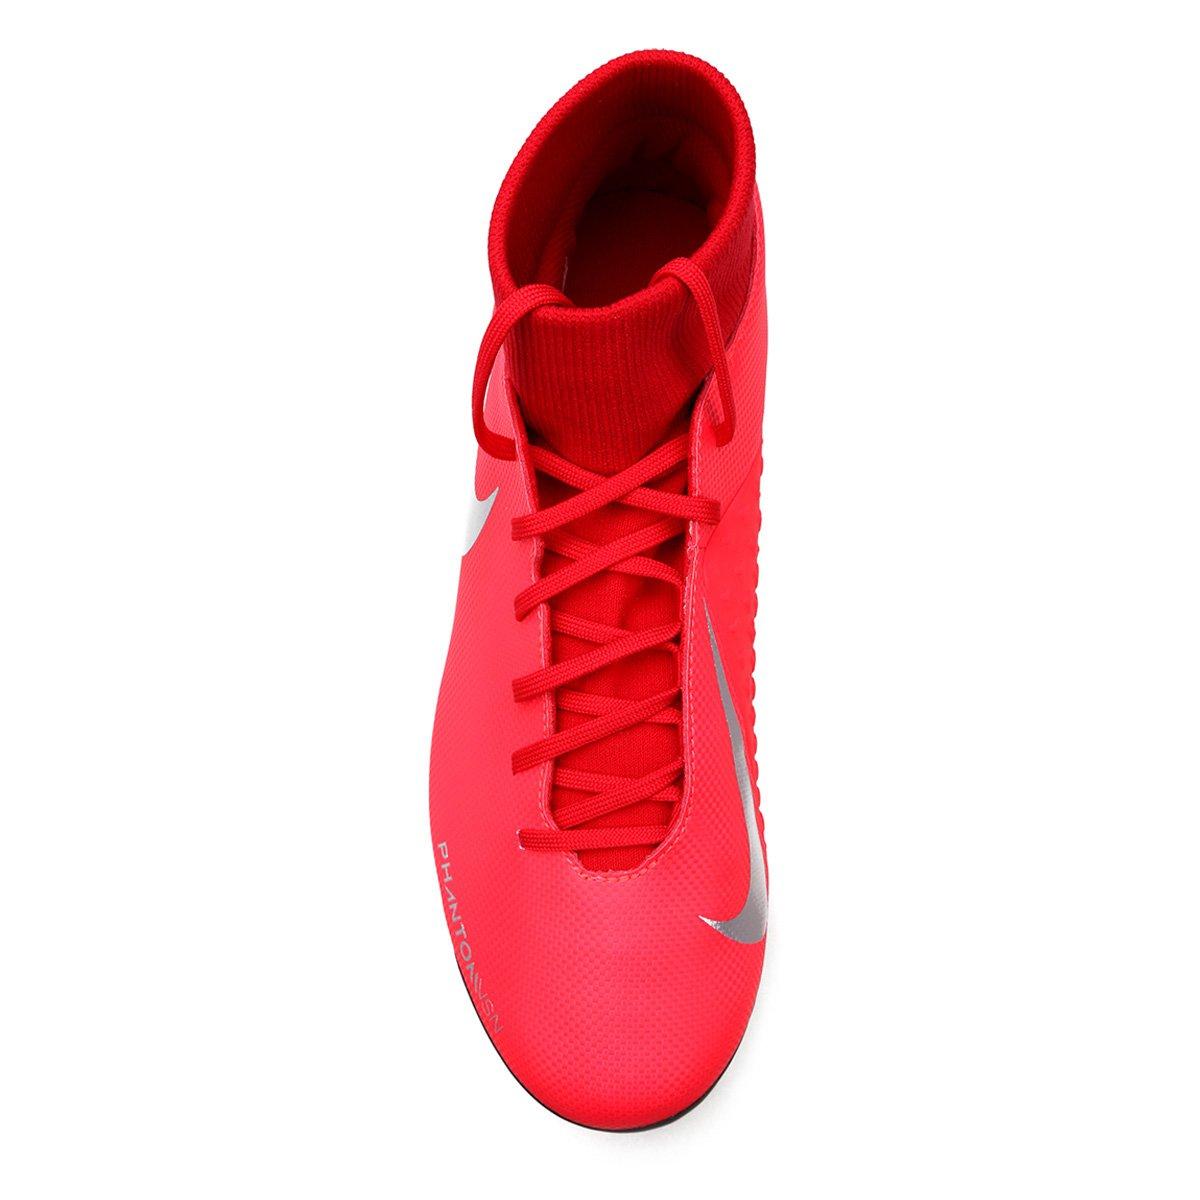 b6c537cbe3 Chuteira Campo Nike Phantom Vision Club FG